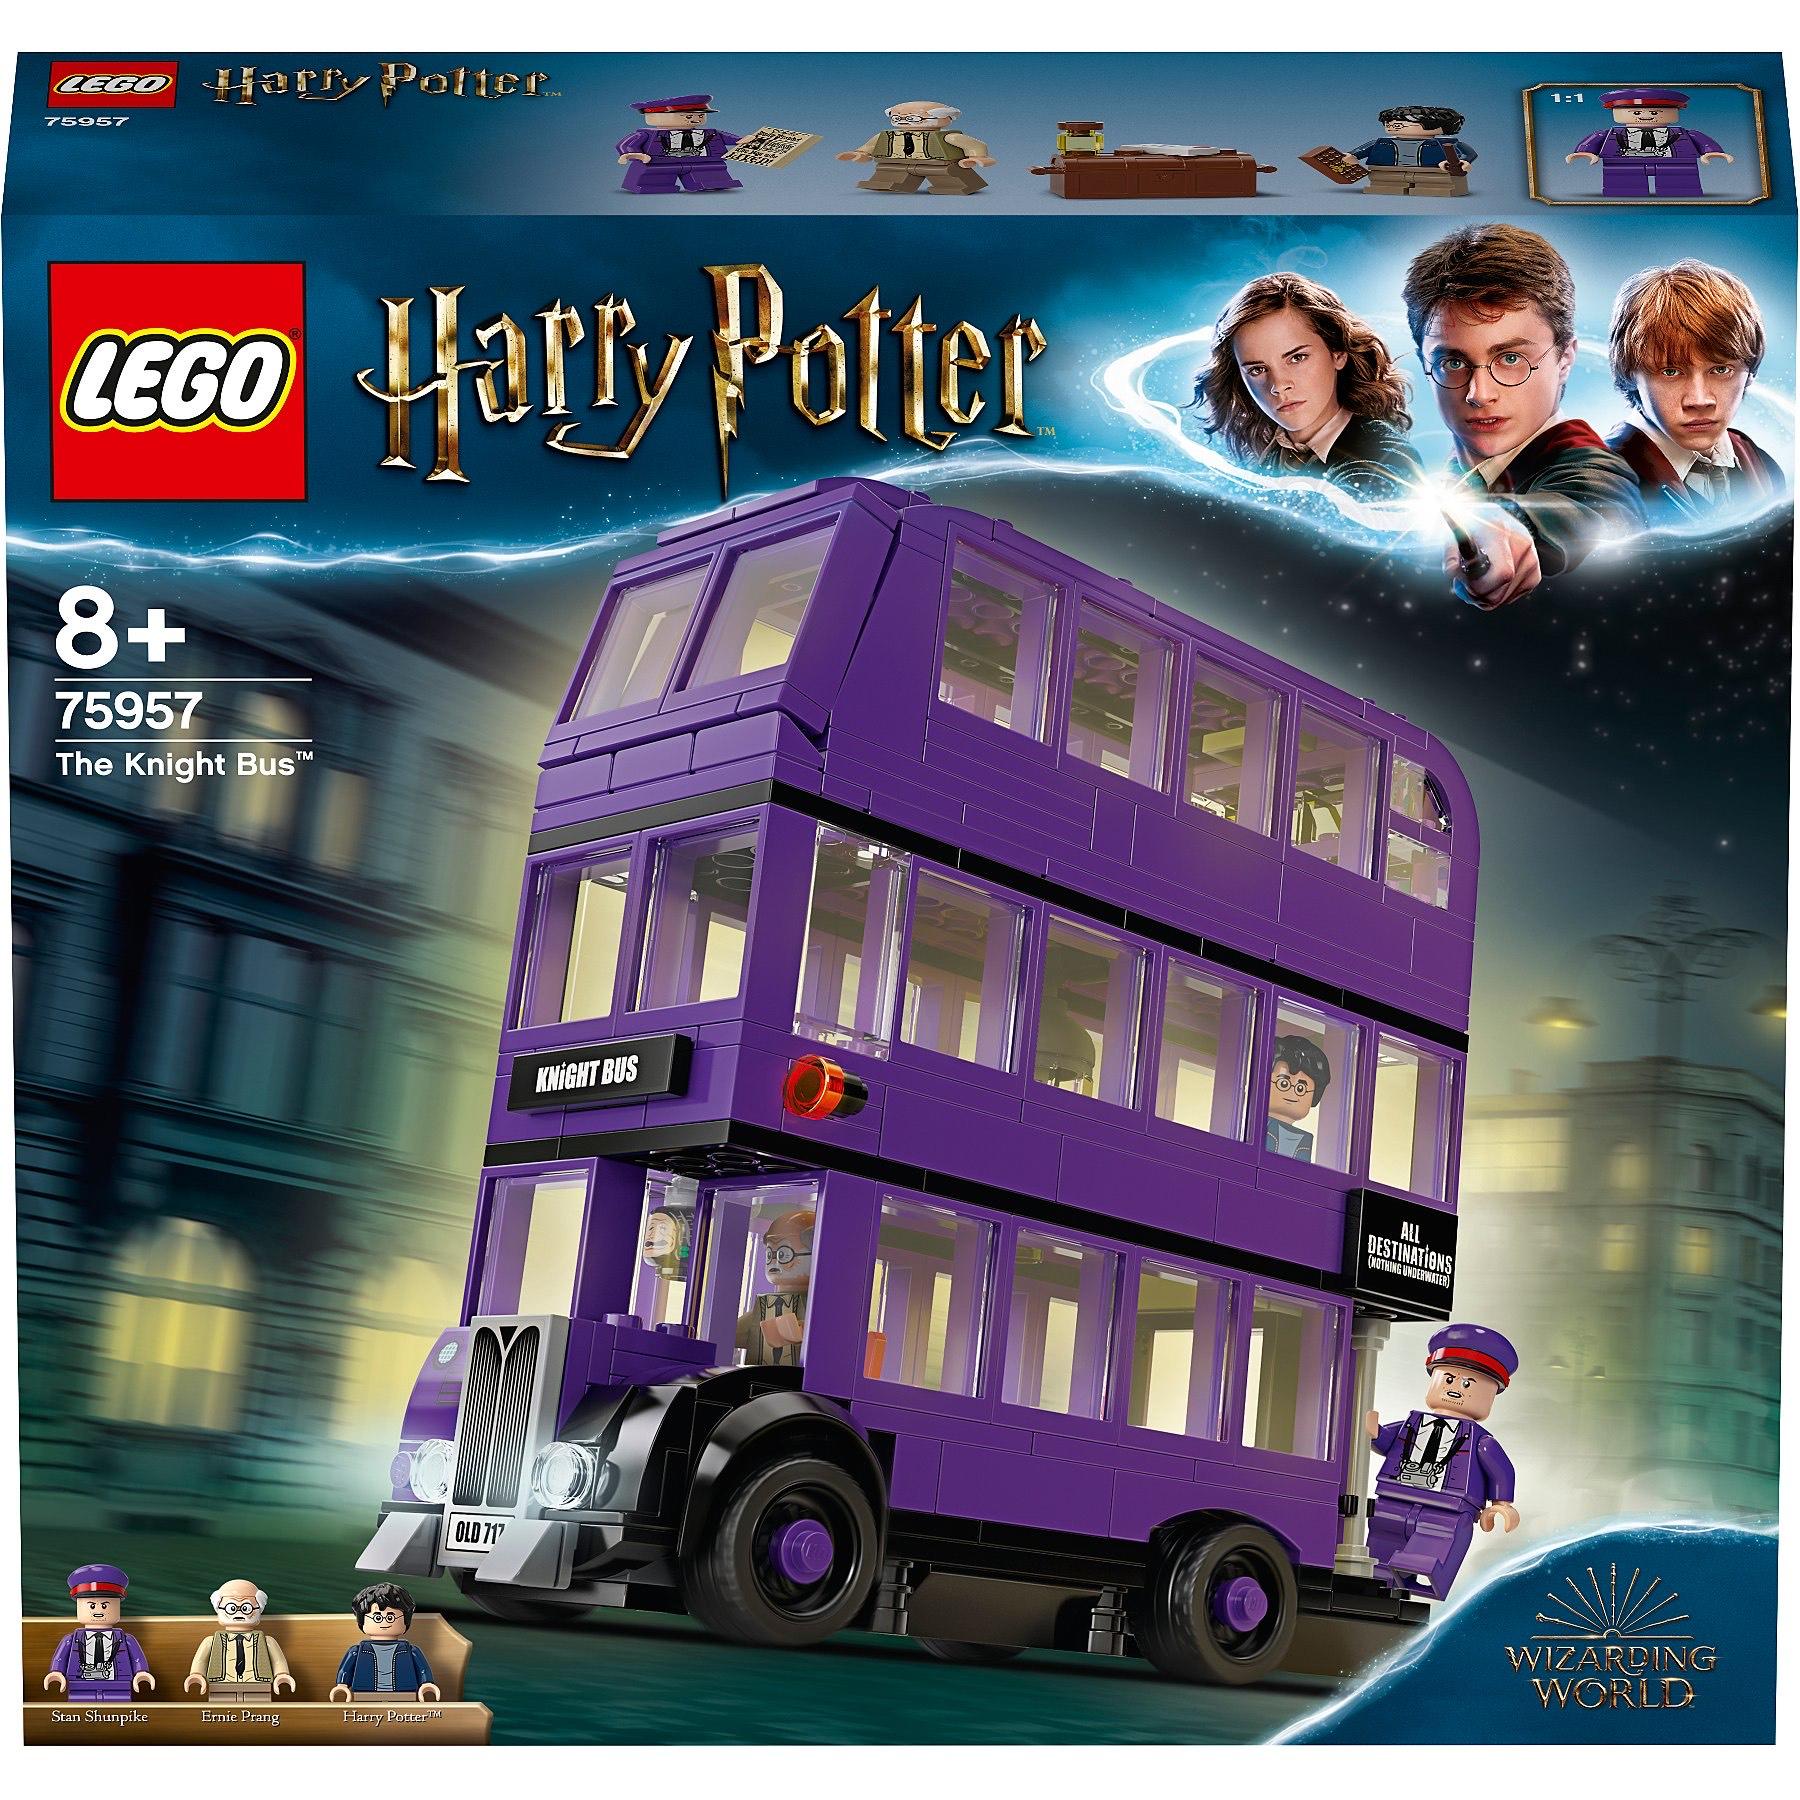 Lego Harry Potter Knight Bus £17.50 @ Tesco (Thornton Heath)